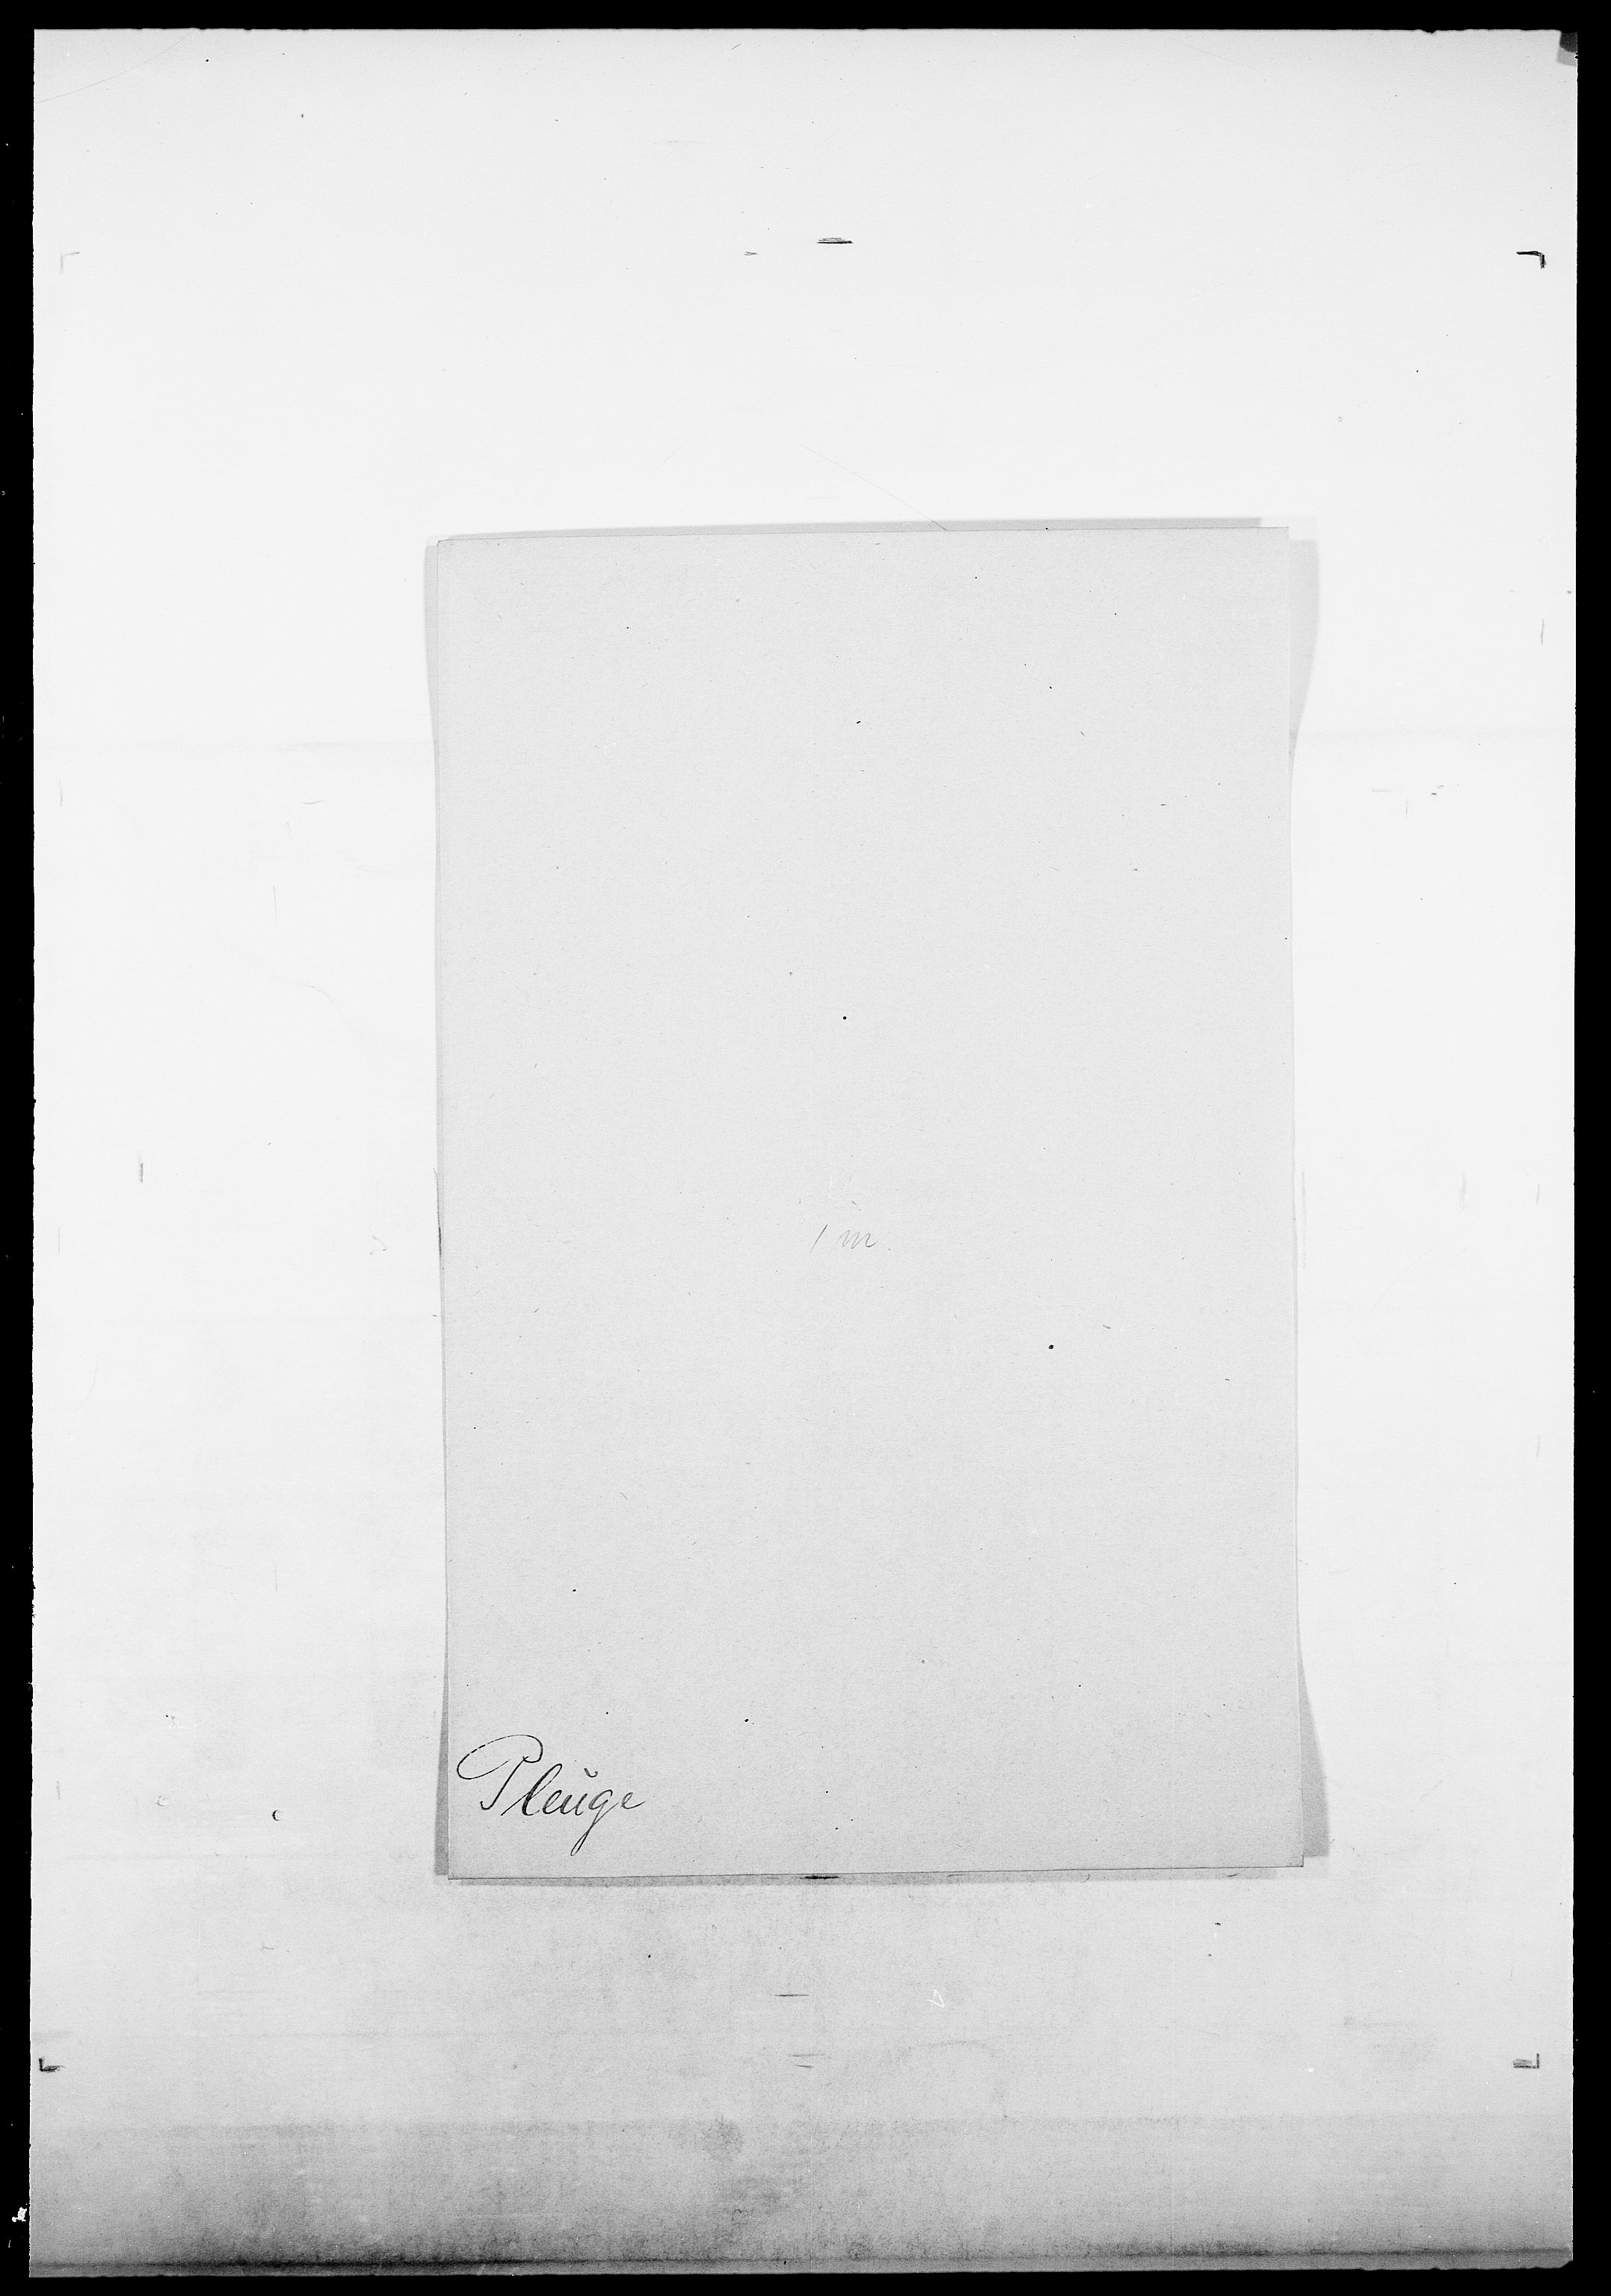 SAO, Delgobe, Charles Antoine - samling, D/Da/L0031: de Place - Raaum, s. 123